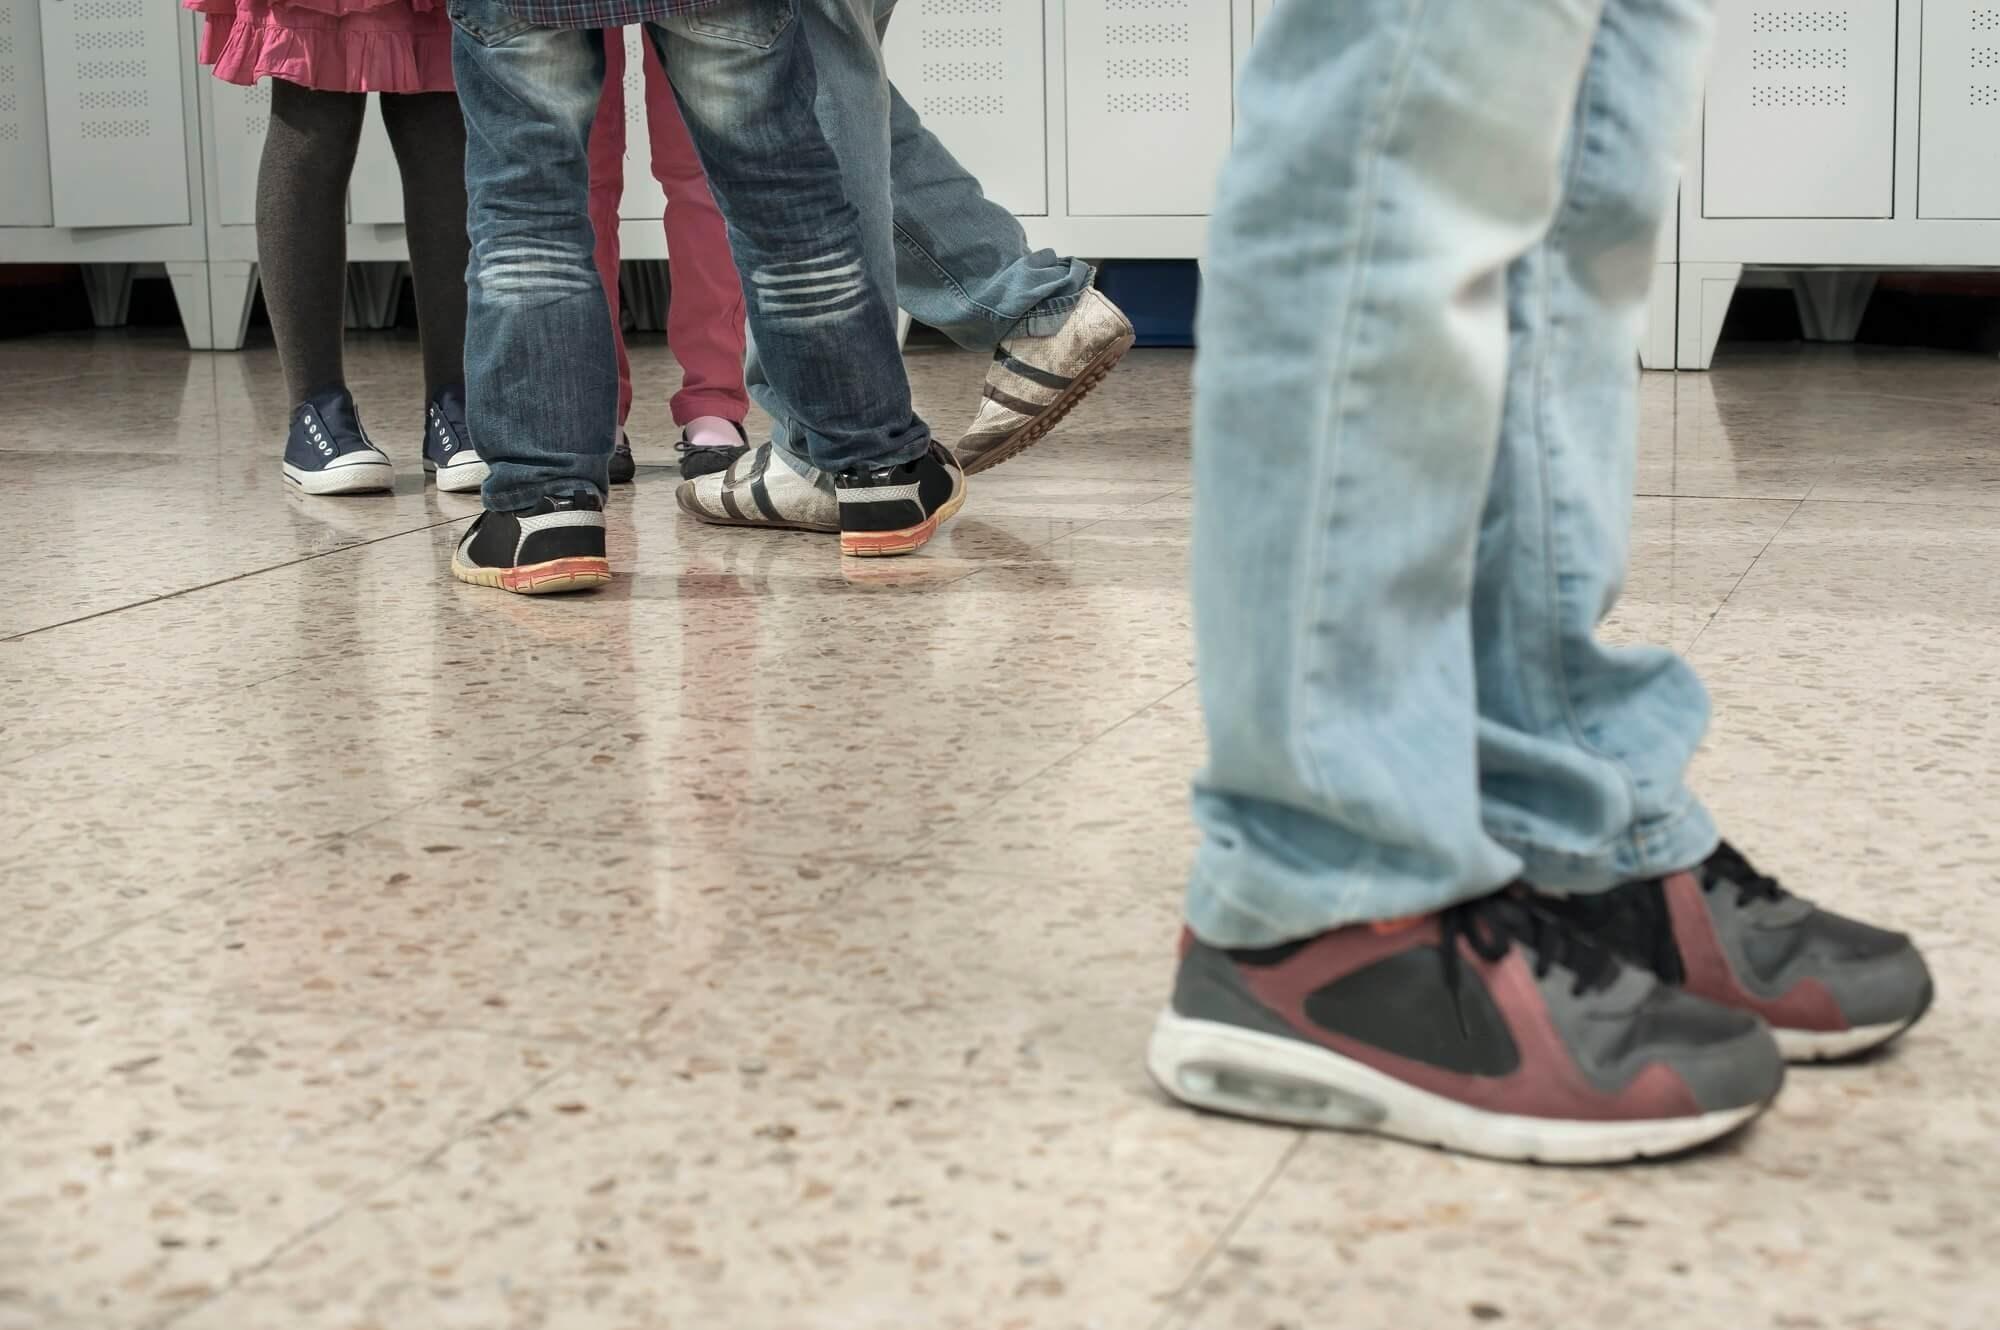 Social Stigma Worsens Mental Health With Autism